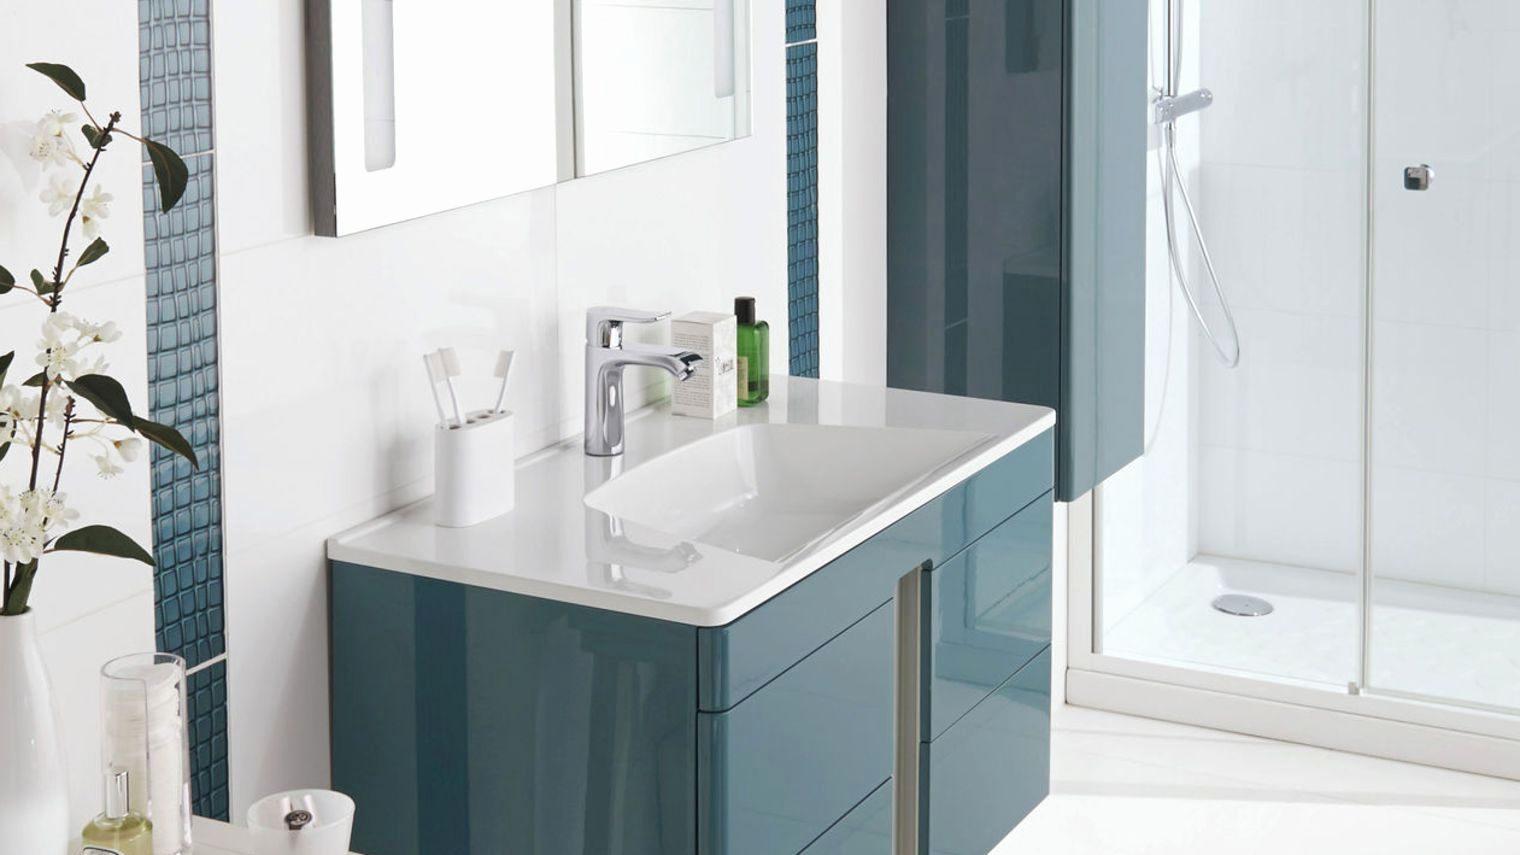 Meuble Salle De Bains Ikea Luxe Photos Meuble sous Vasque Ikea Nouveau Lave Main Ikea Frais Meuble Lave